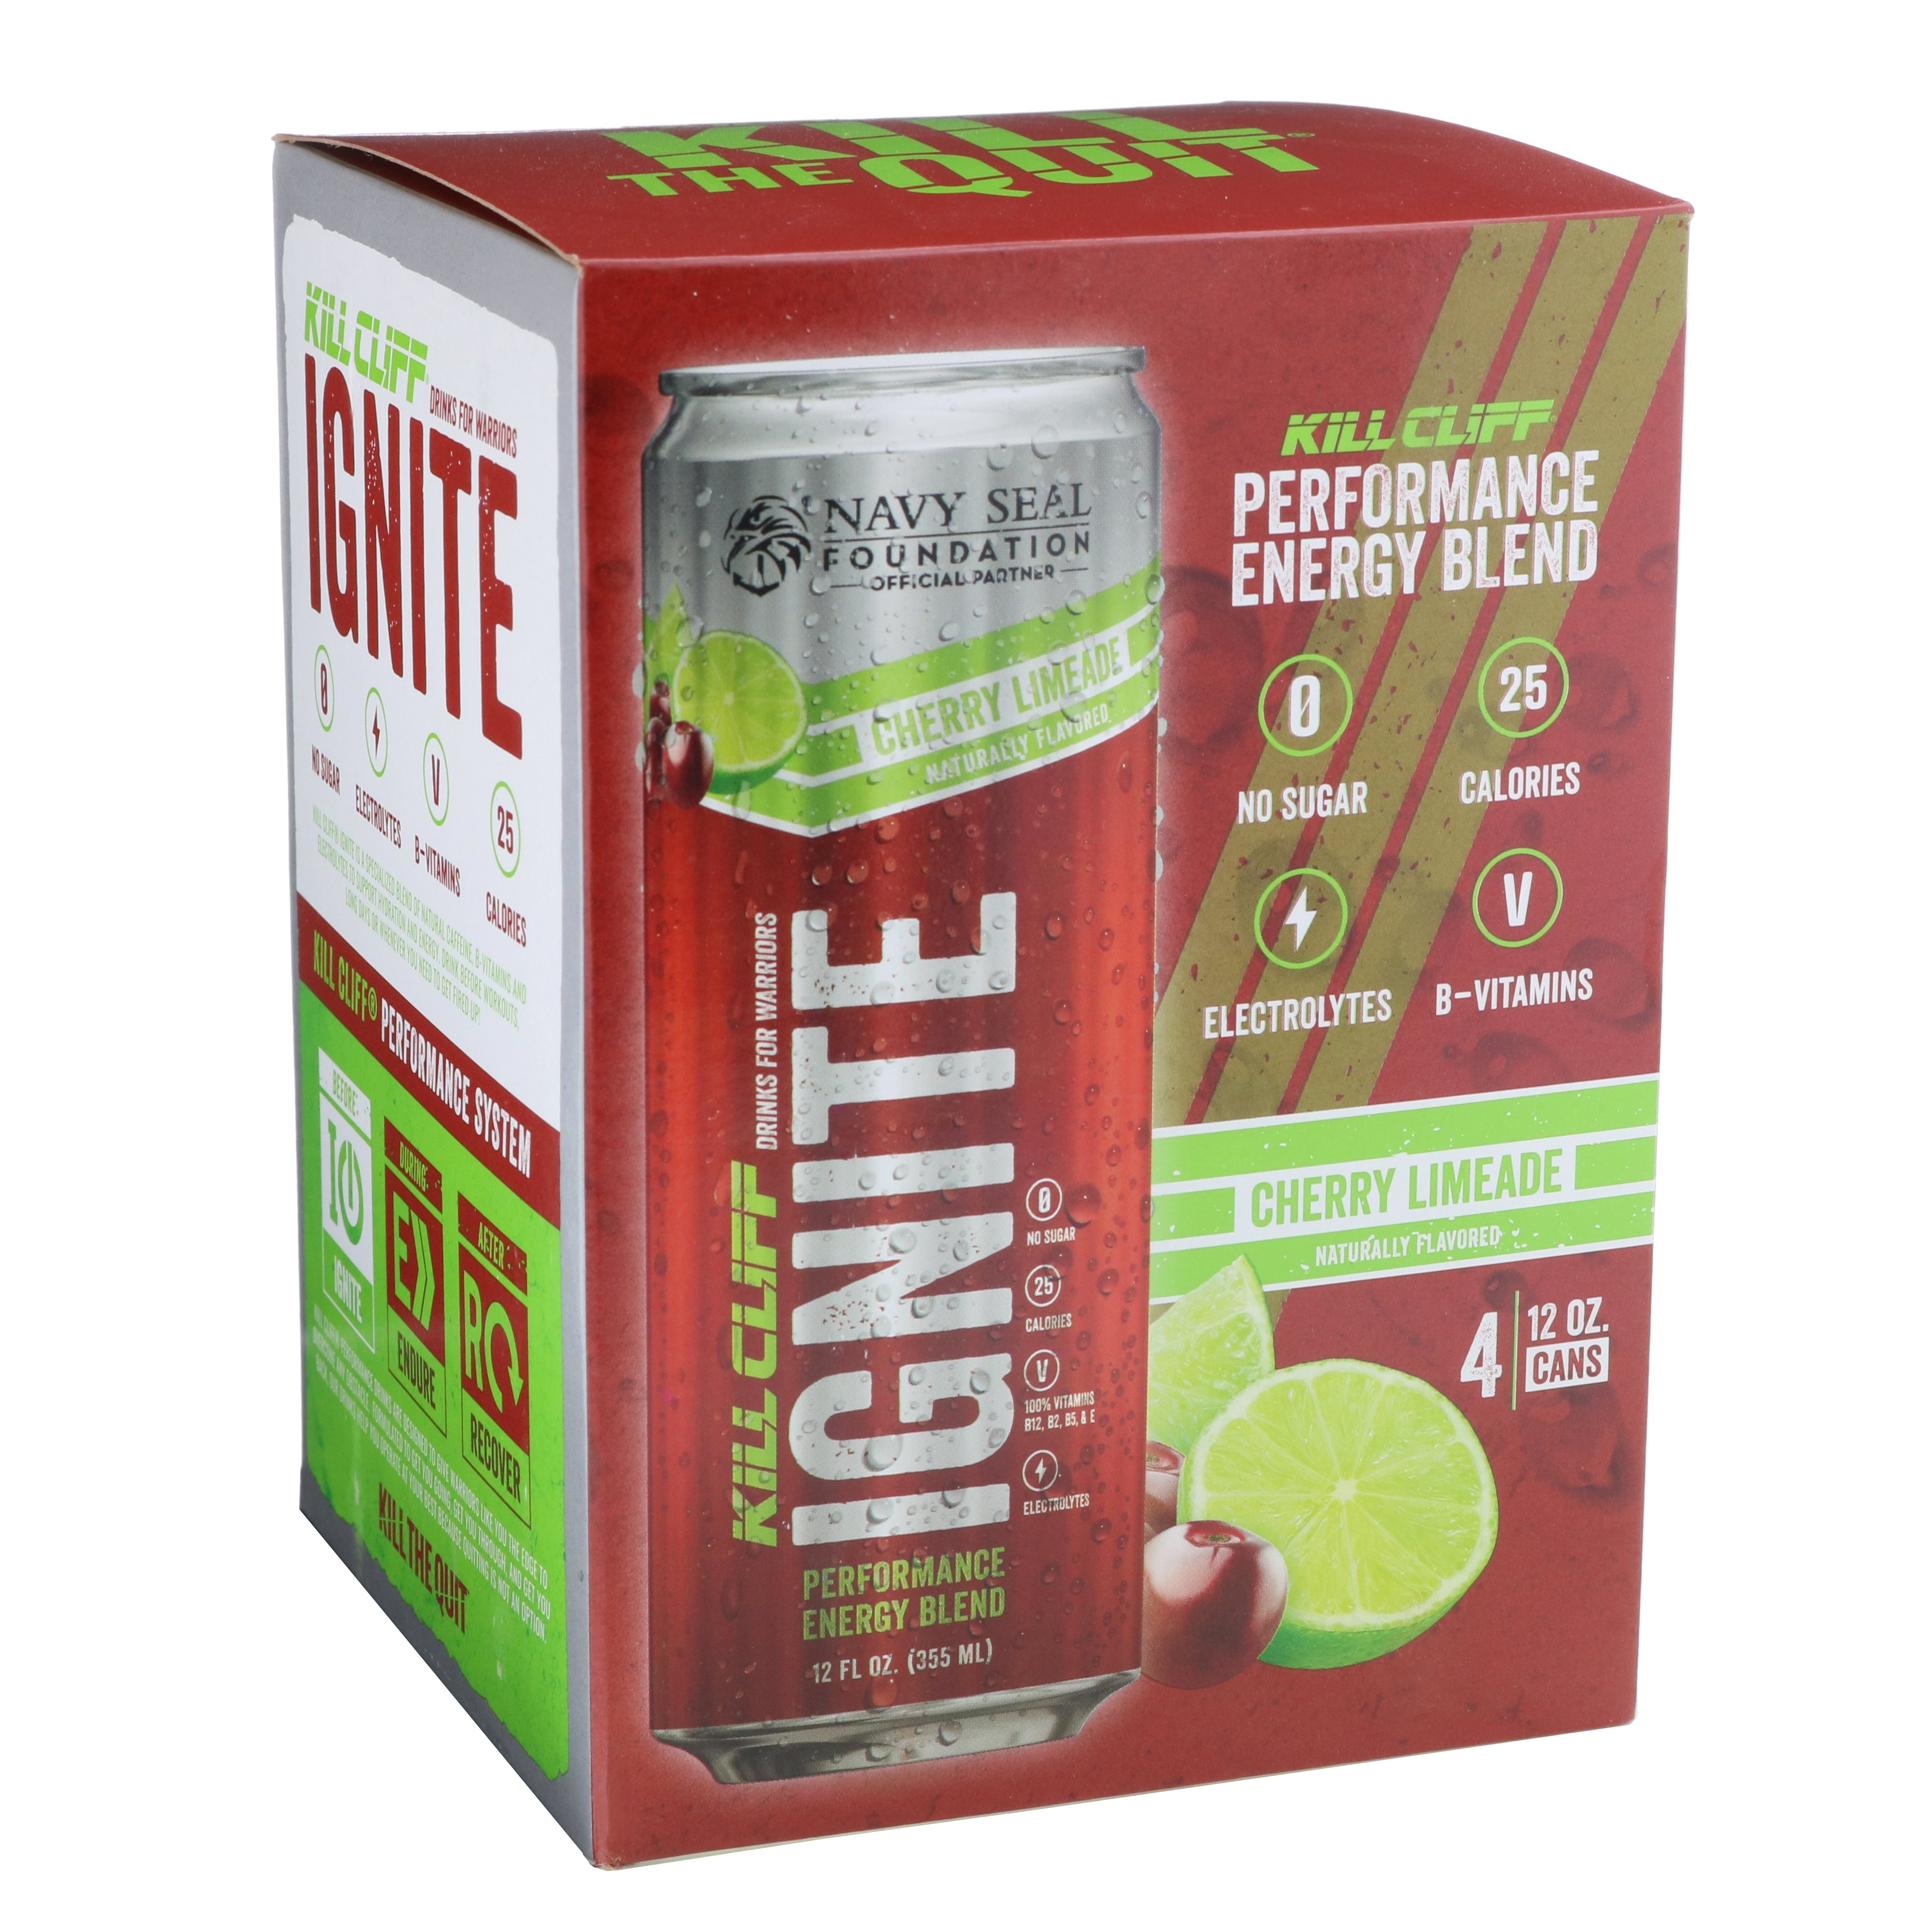 Kill Cliff Ignite Cherry Limeade Energy Drink 4 Pk Shop Diet Fitness At H E B